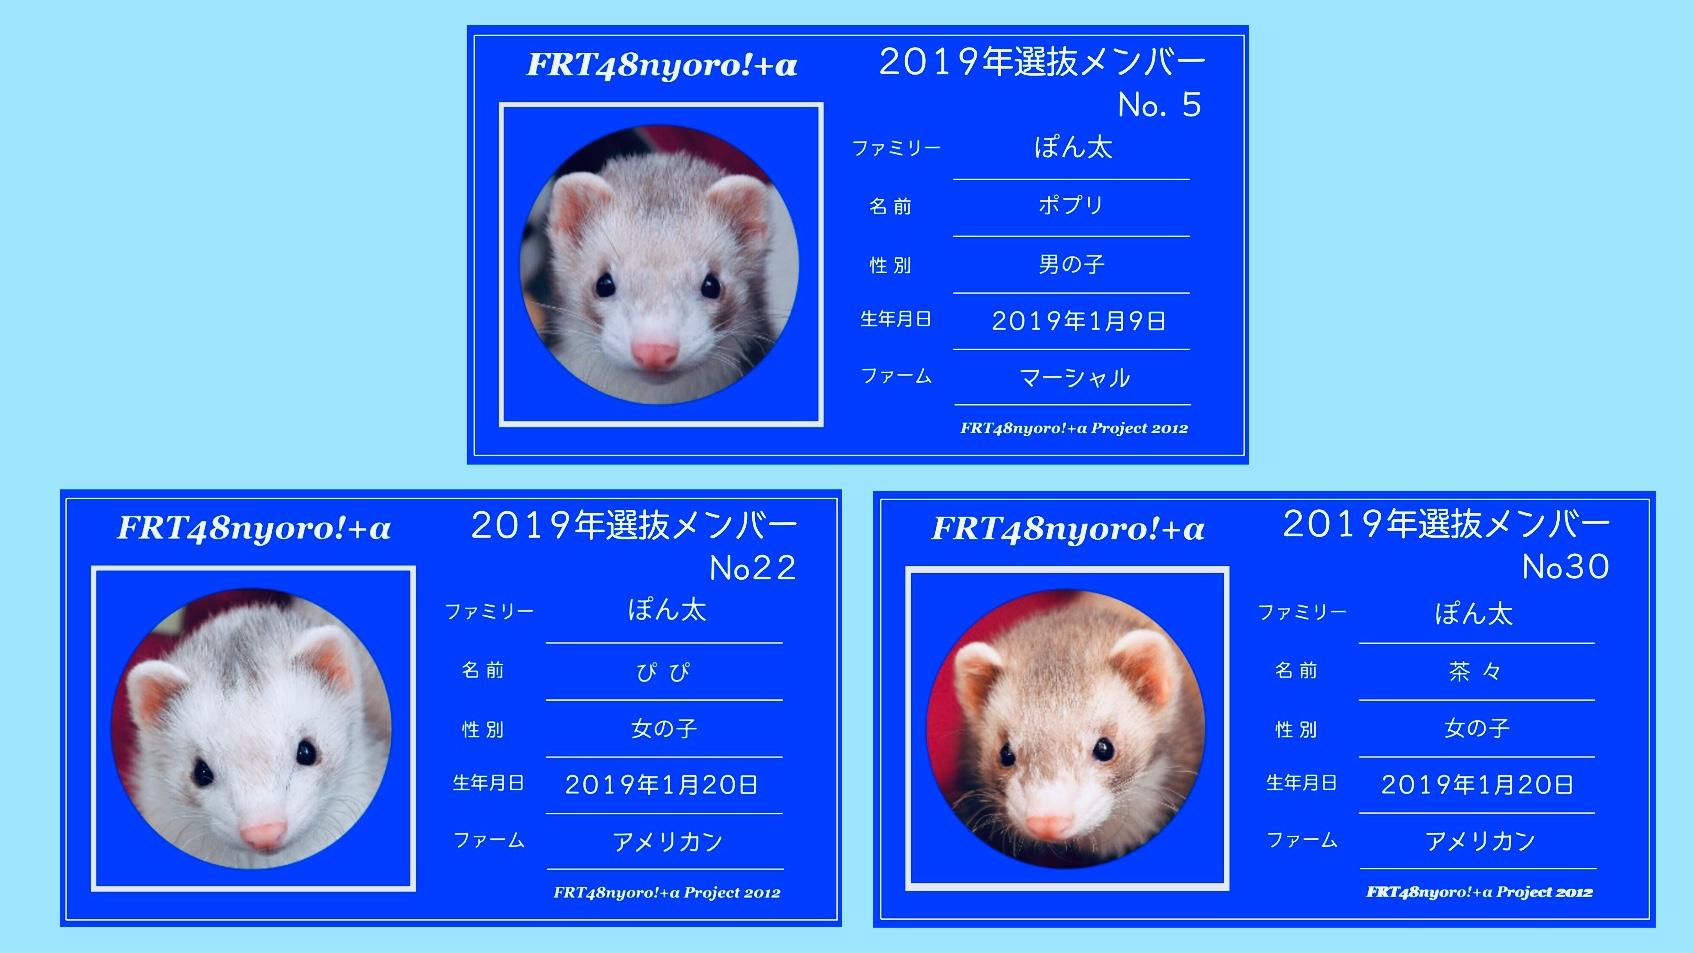 4FA6D64D-C9FA-44AD-9BE7-E4D929D35C67.jpeg